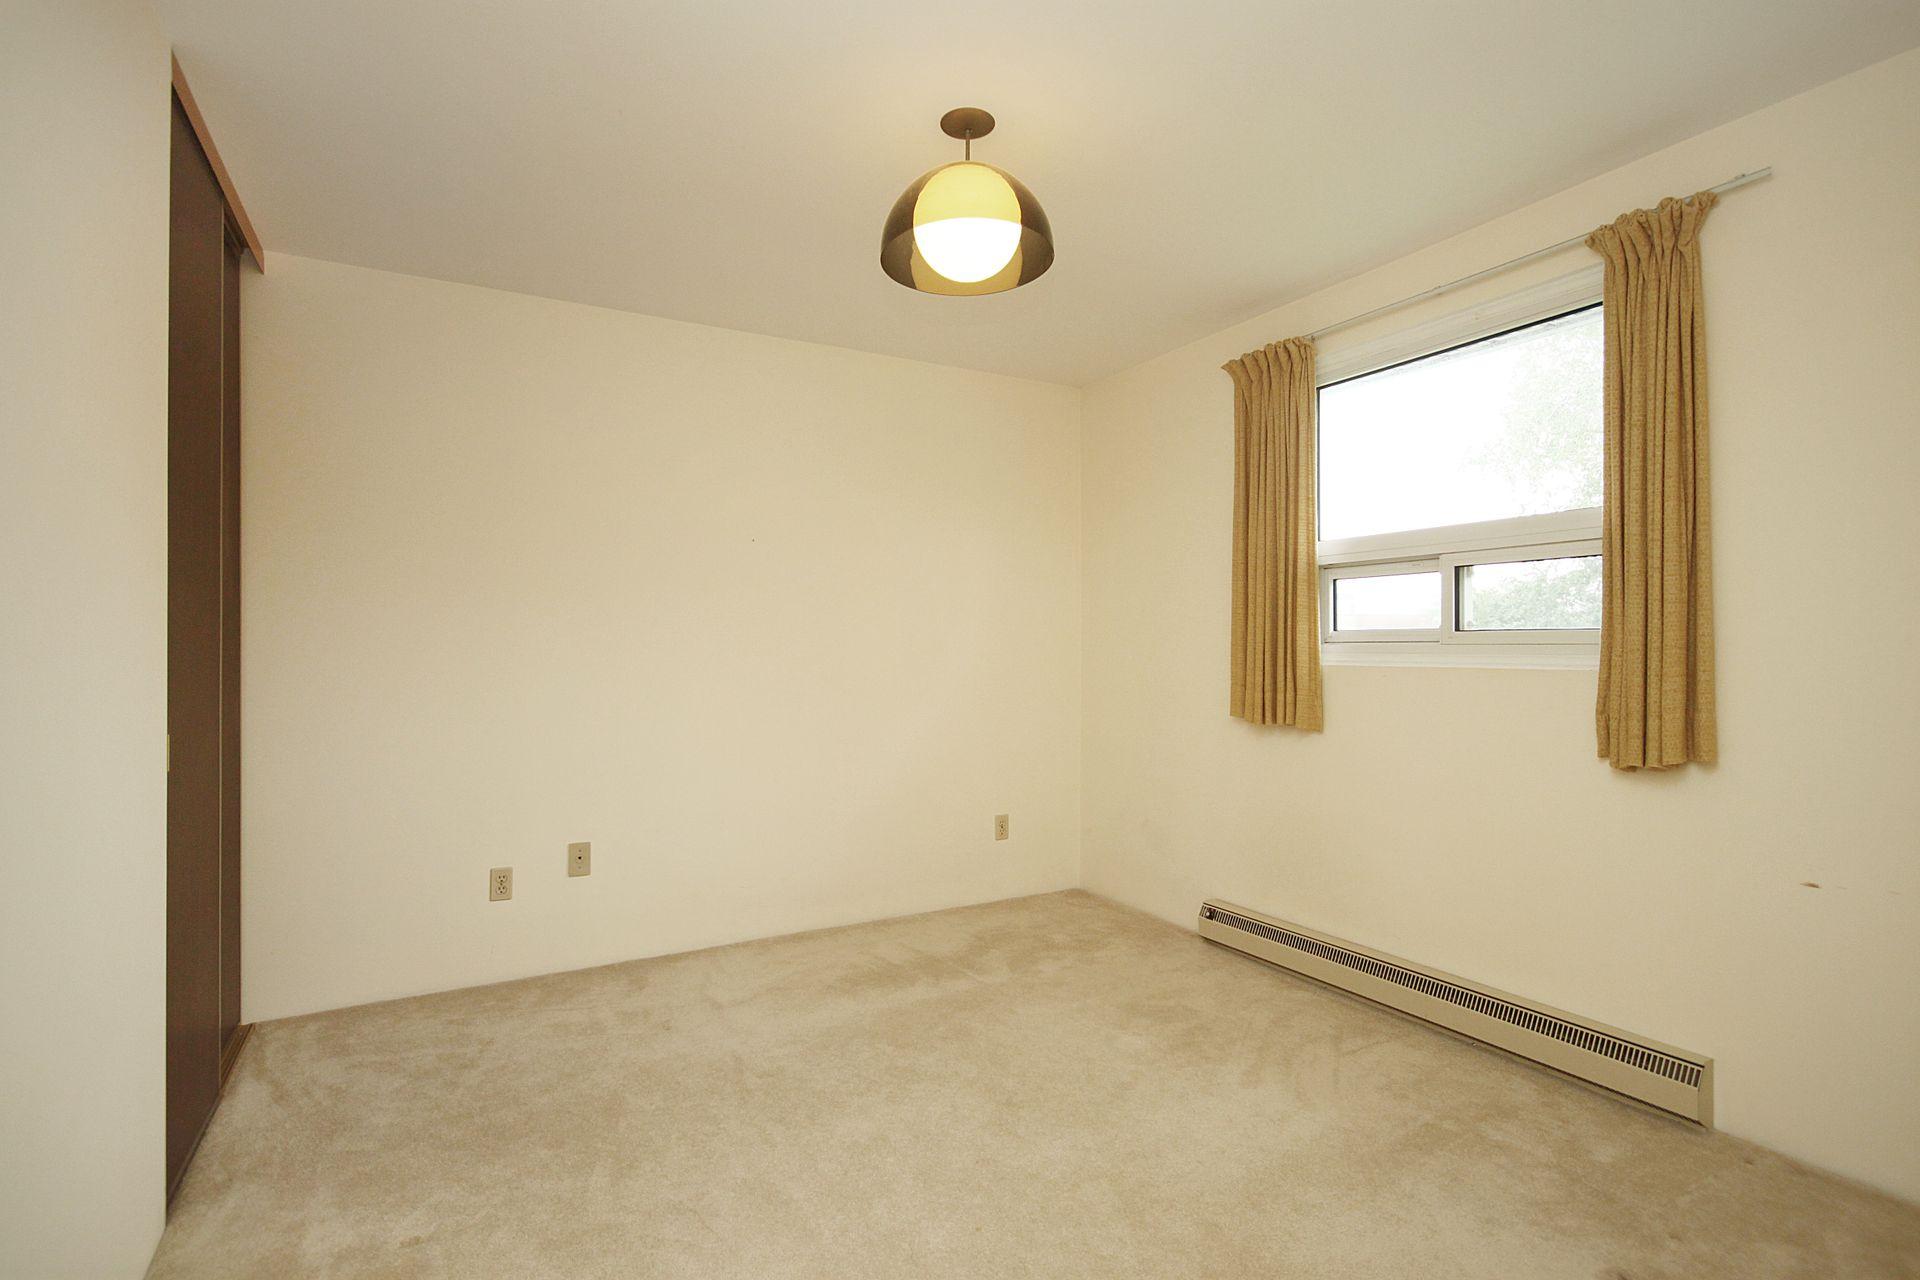 Bedroom at 9 Deerpath Road, Parkwoods-Donalda, Toronto